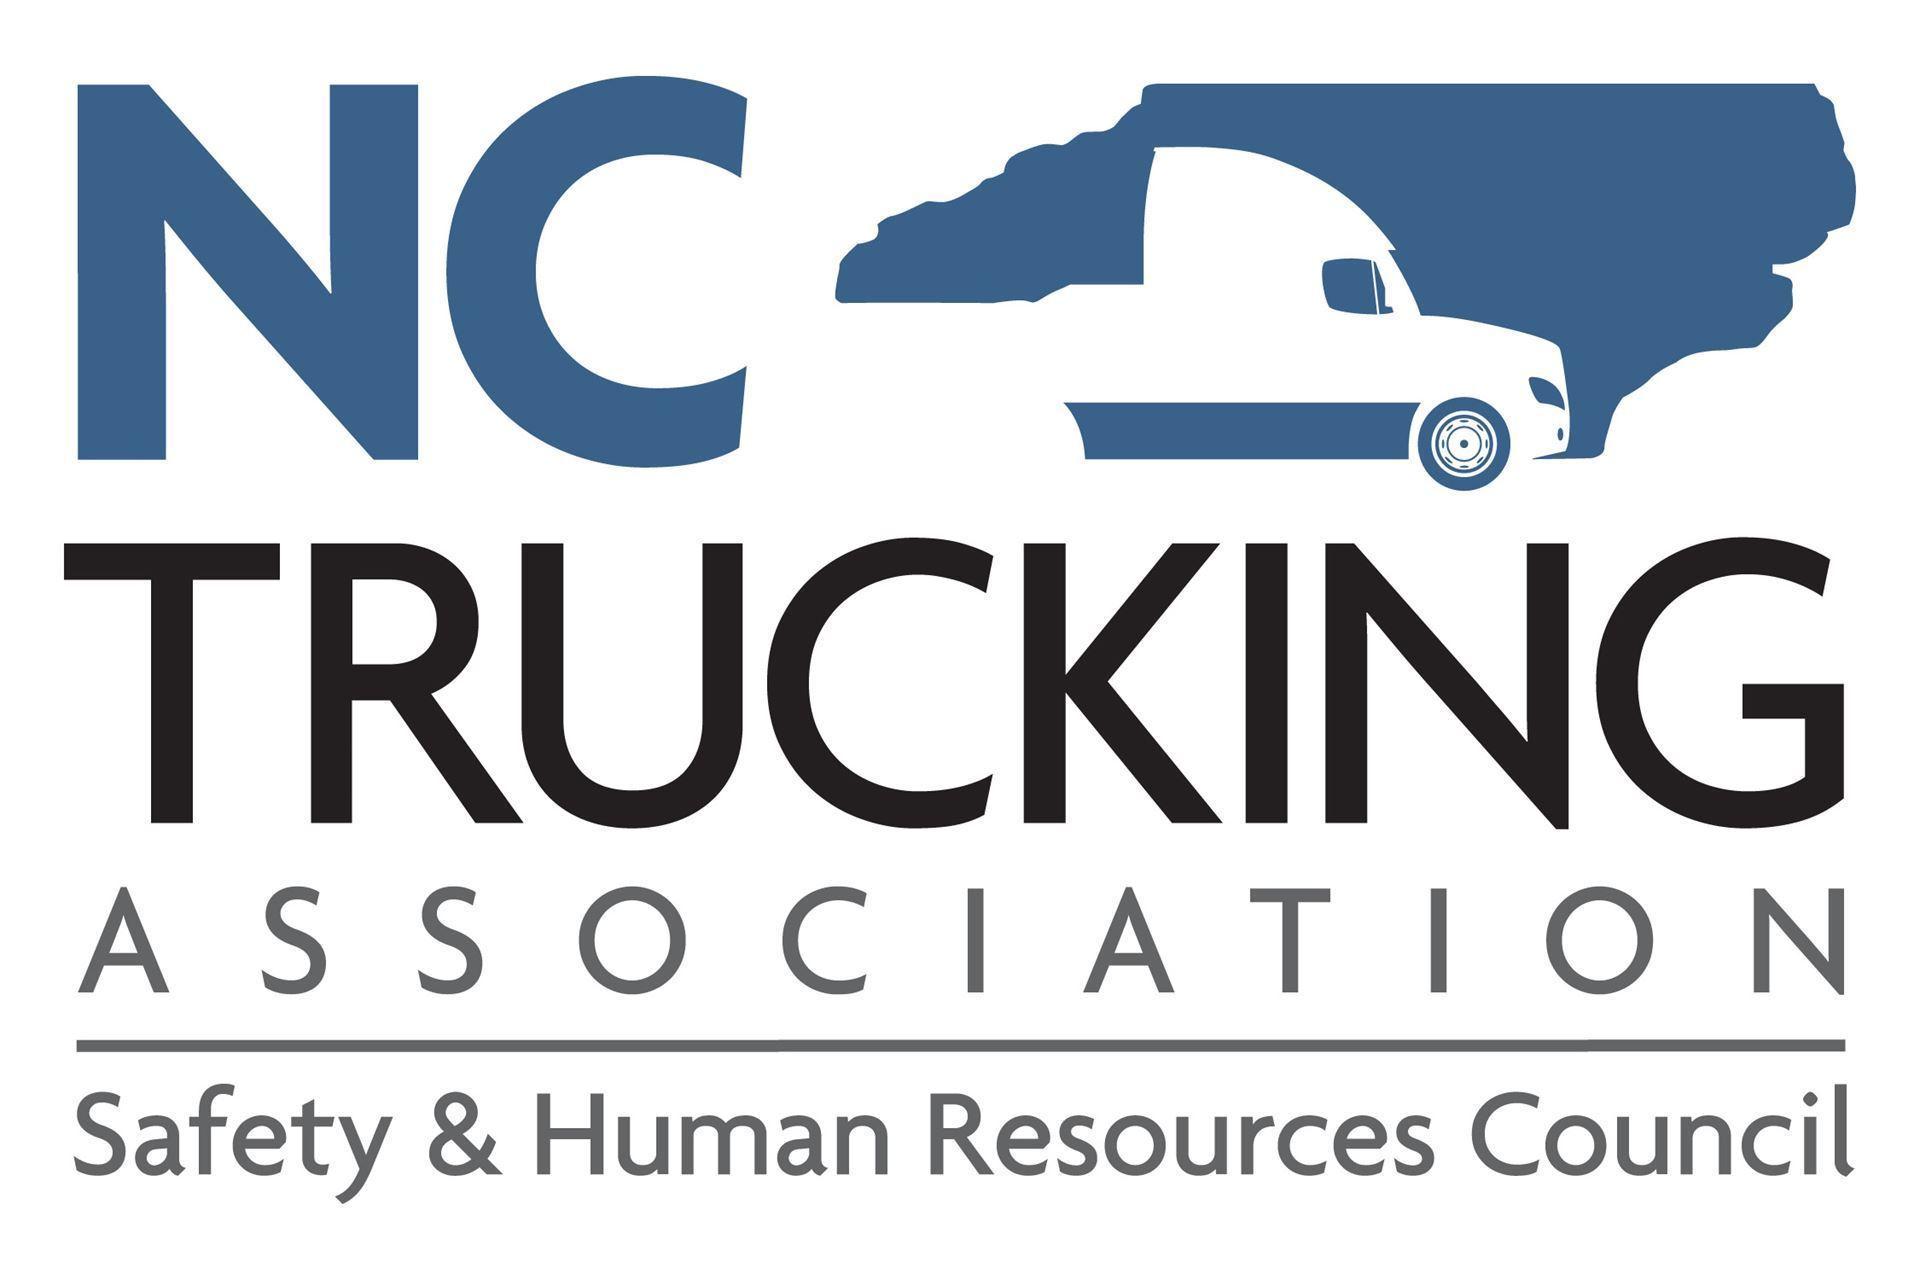 SHRC Meeting: 6/11/20 ELD Problems